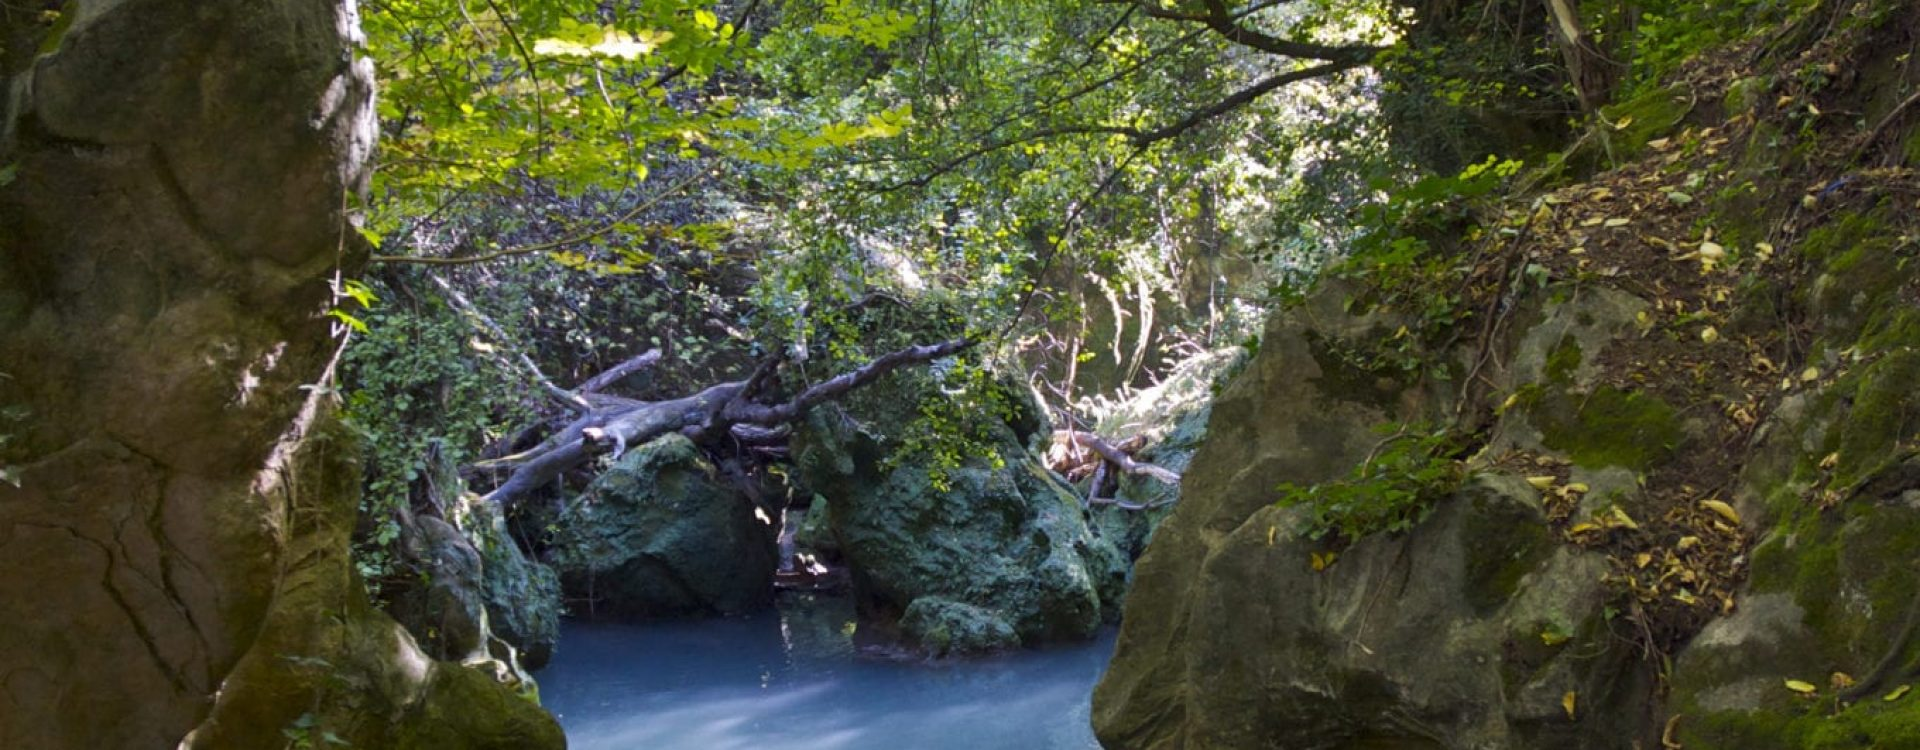 _fiume 10